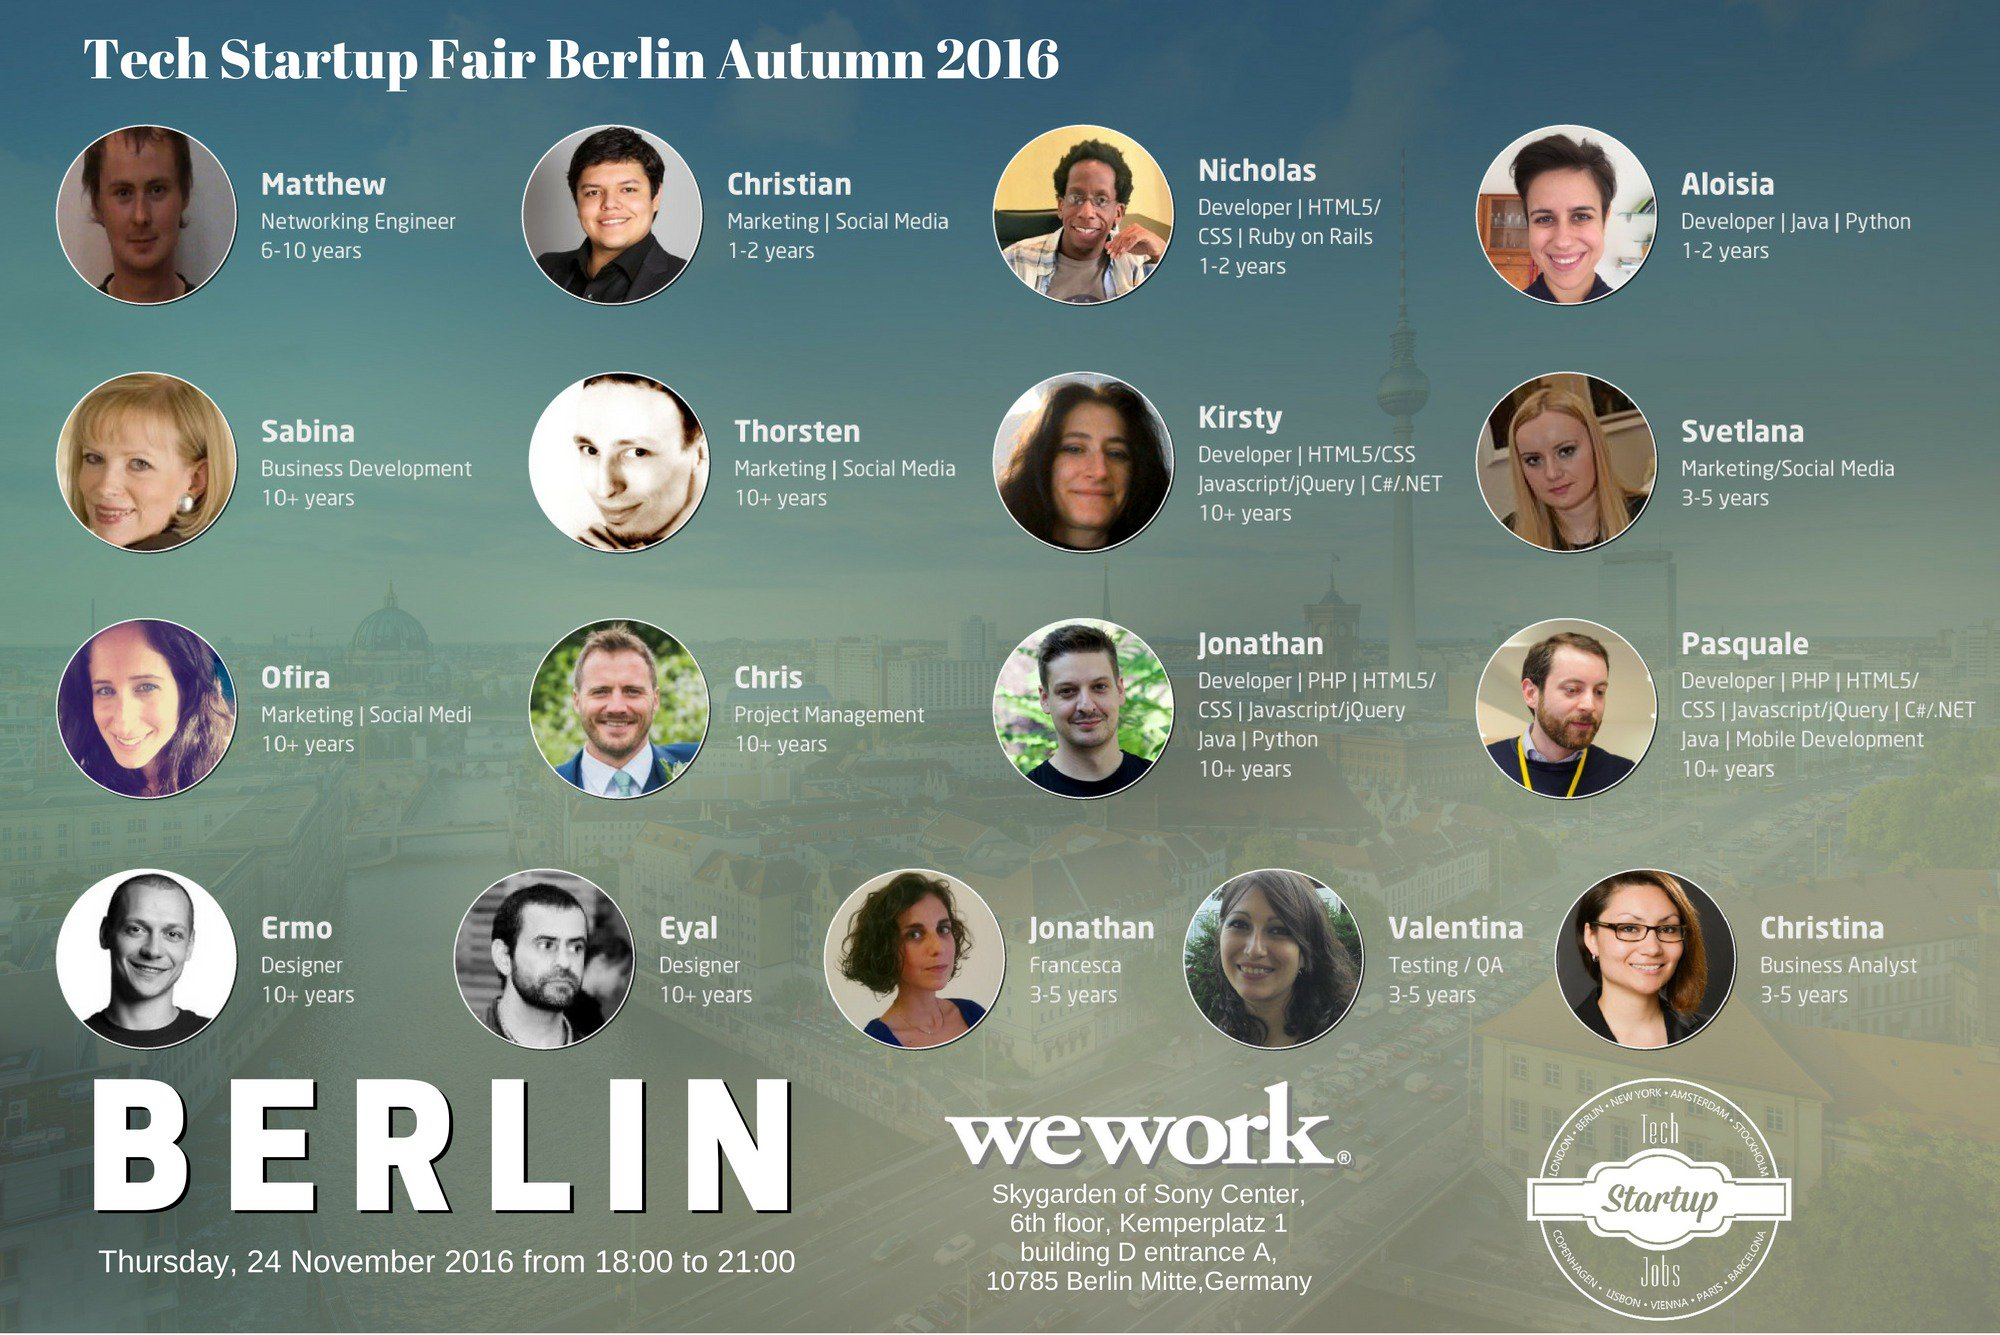 ⚡️Looking for a #job ? Good #news : Join #Berlin Tech Startup Fair Autumn https://t.co/iAcNyccJln #jobfair #hiring #event #tech #startup https://t.co/8RV4oYYdy0